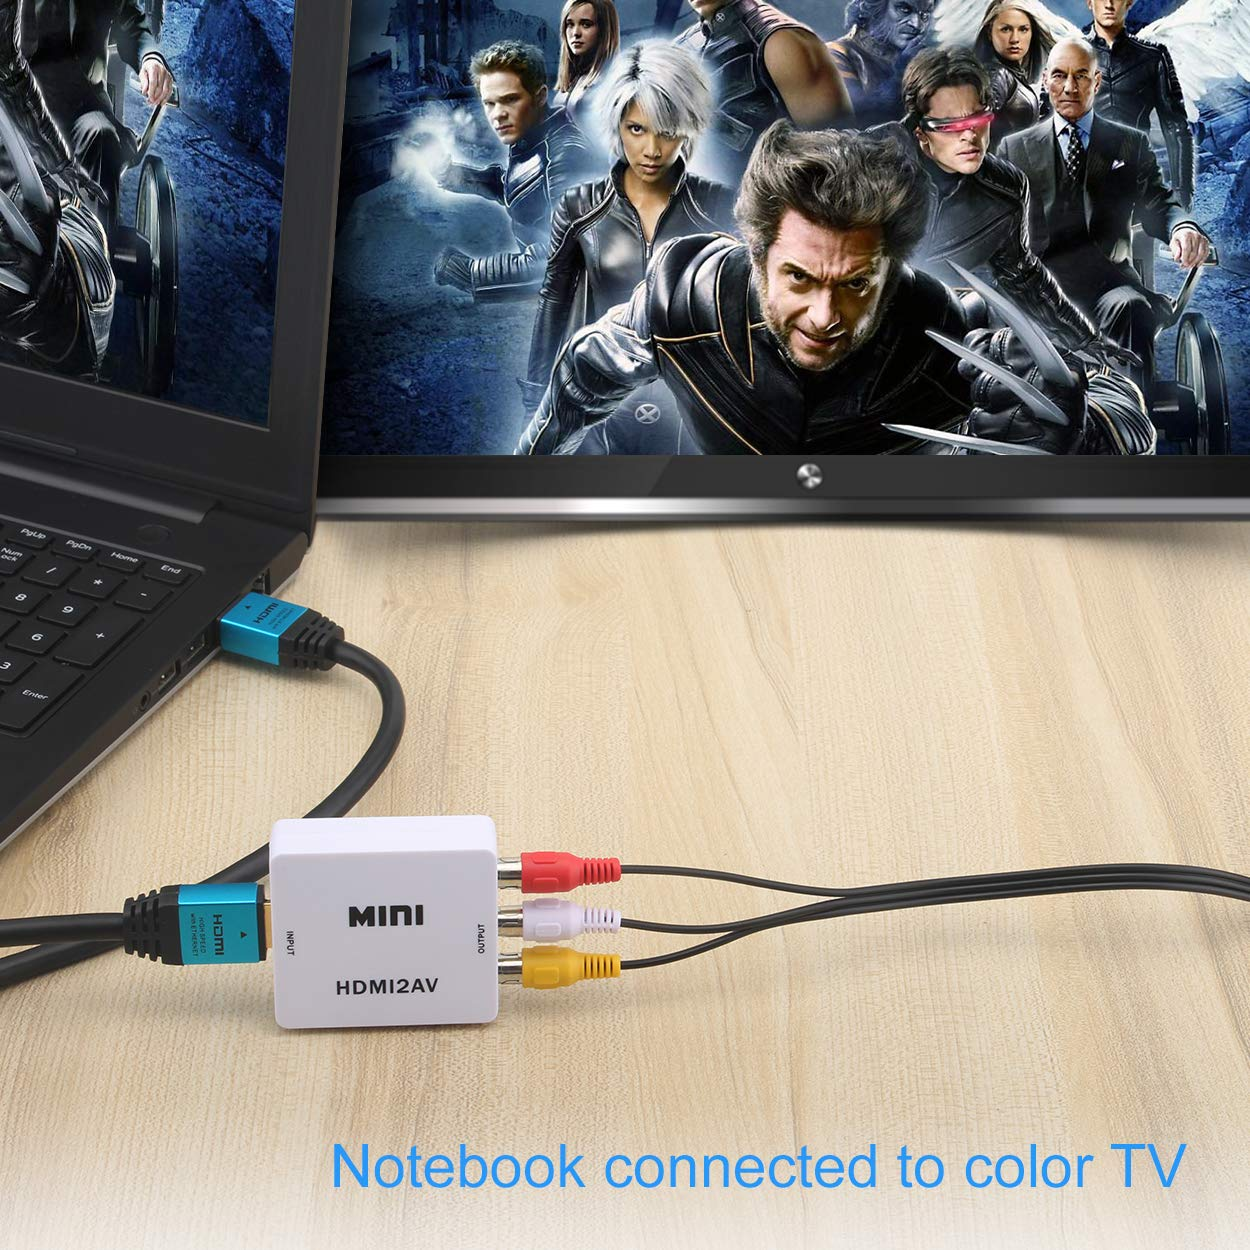 Convertitore HDMI-AV 1080P Convertitore Adattatore Audio Video DVC da HDMI a RCA per HDTV-Bianco